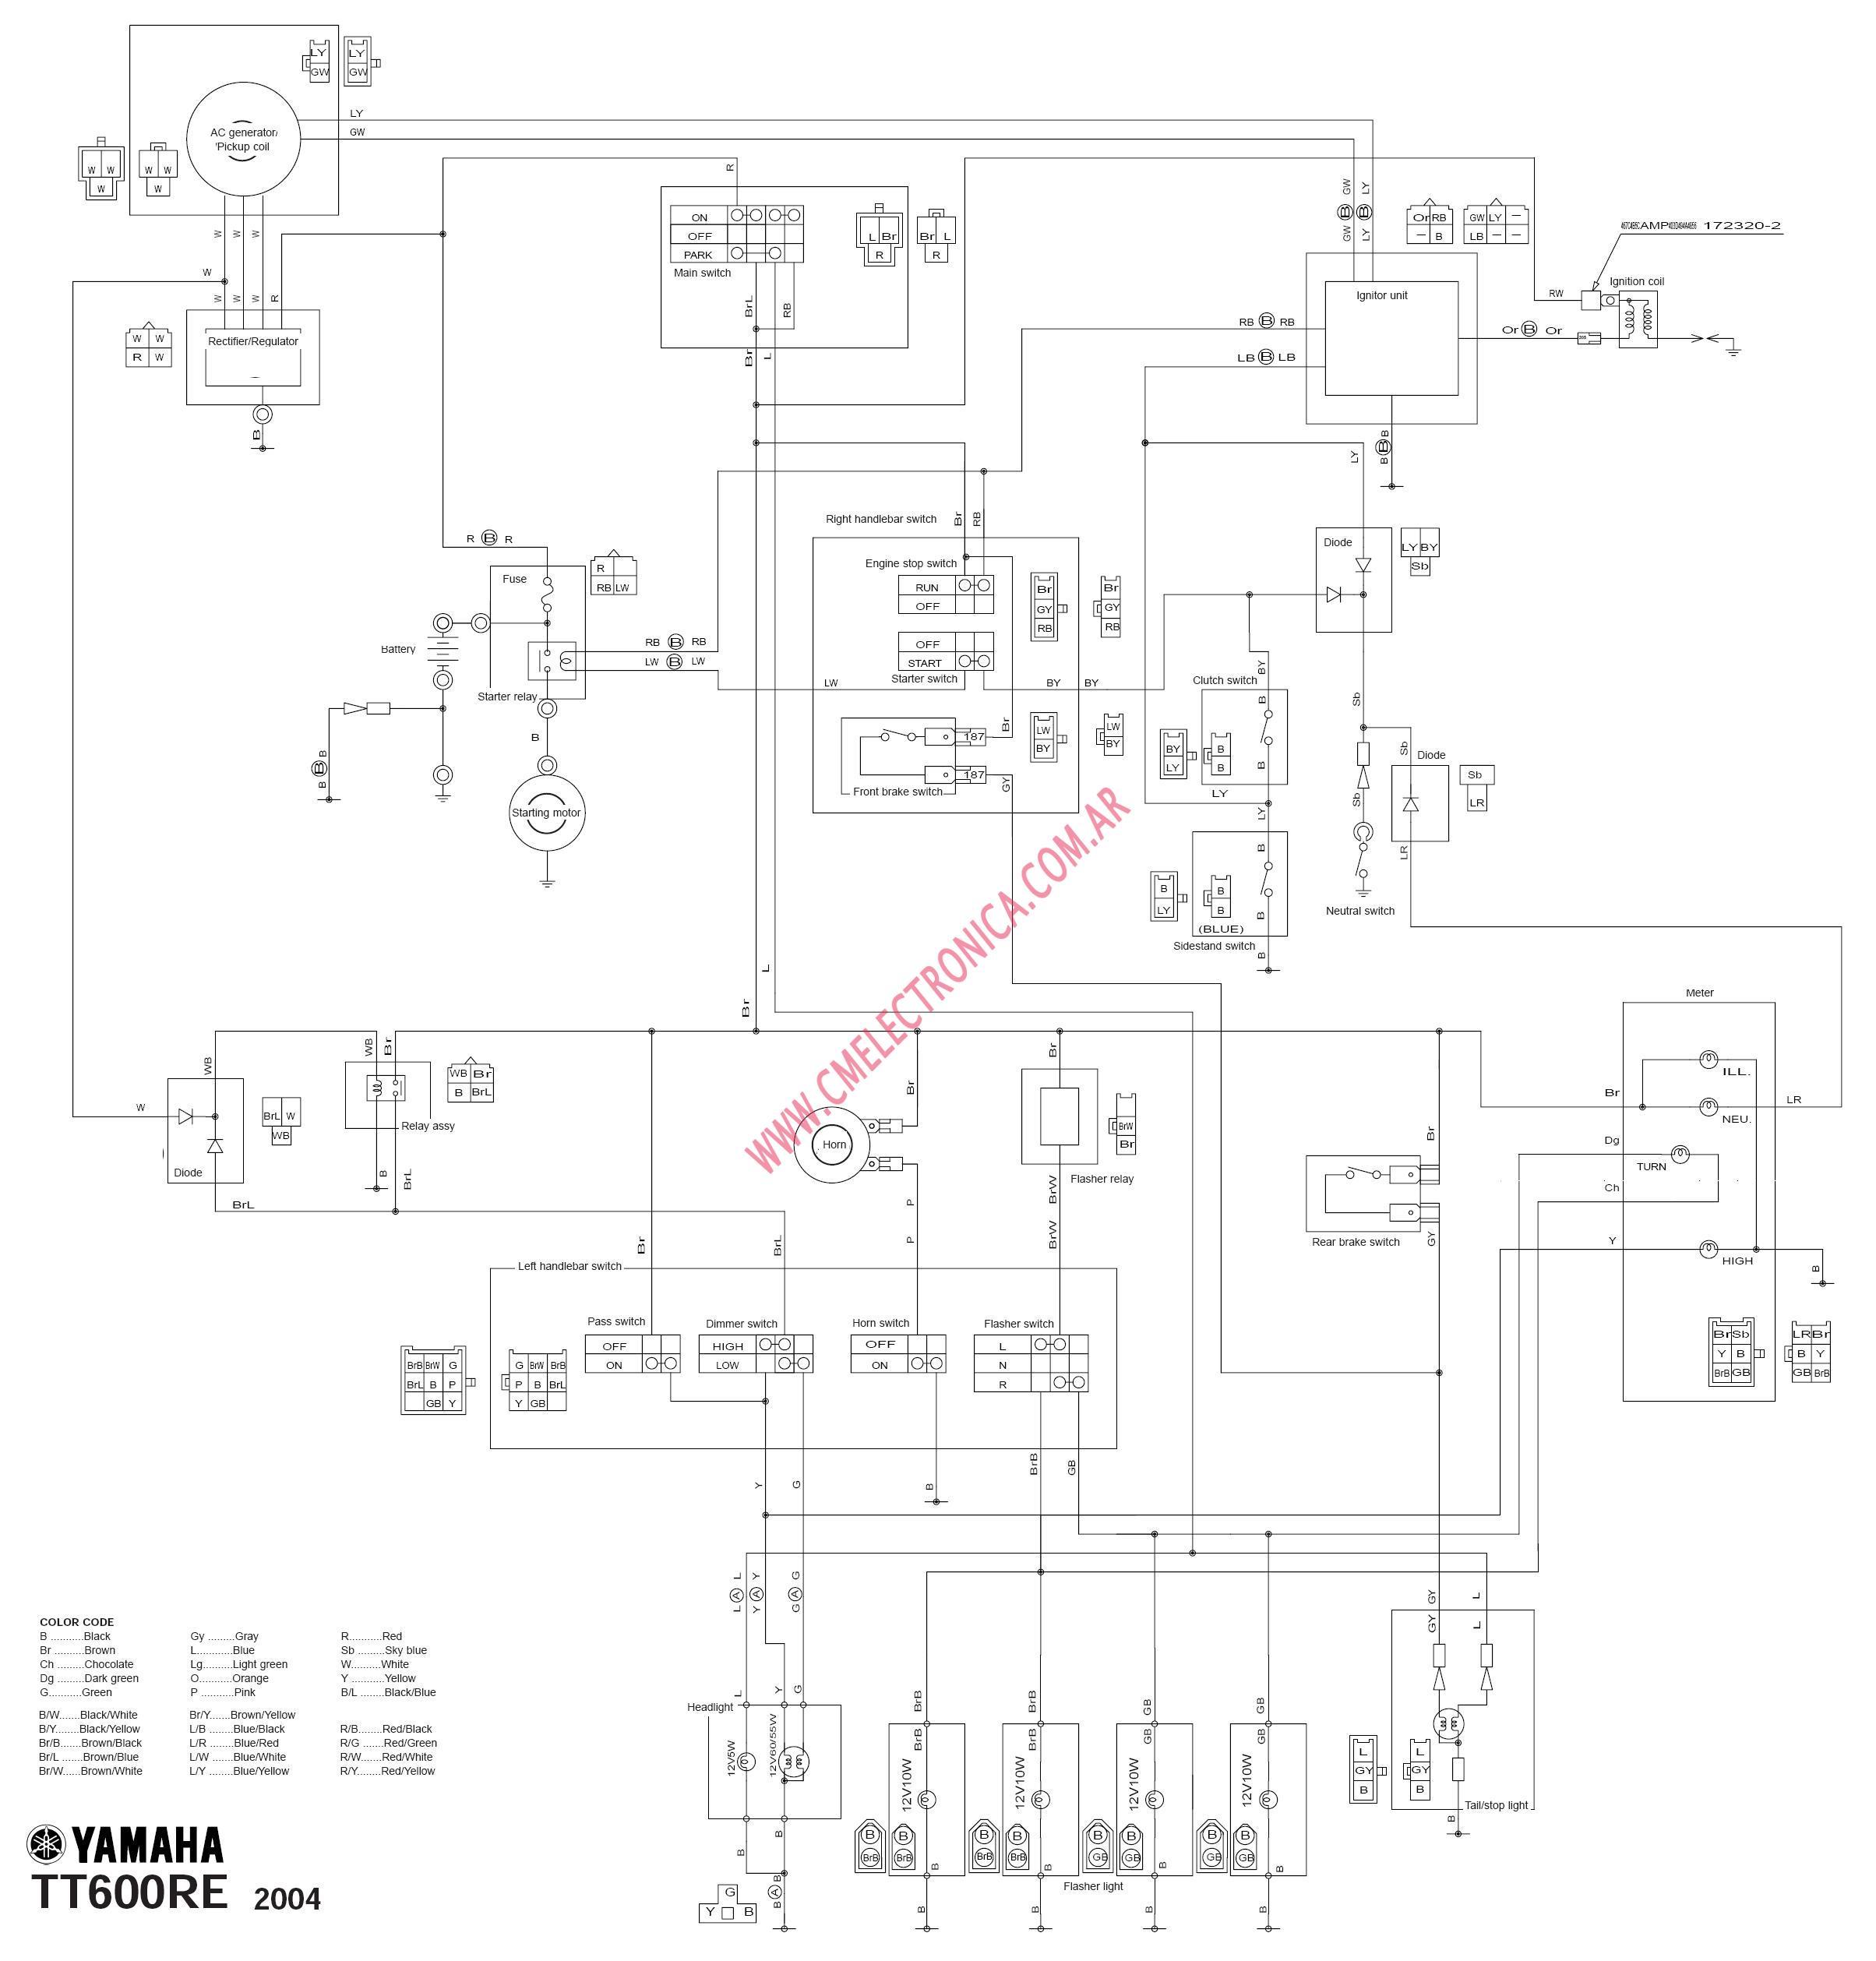 Diagrama Yamaha Tt600re